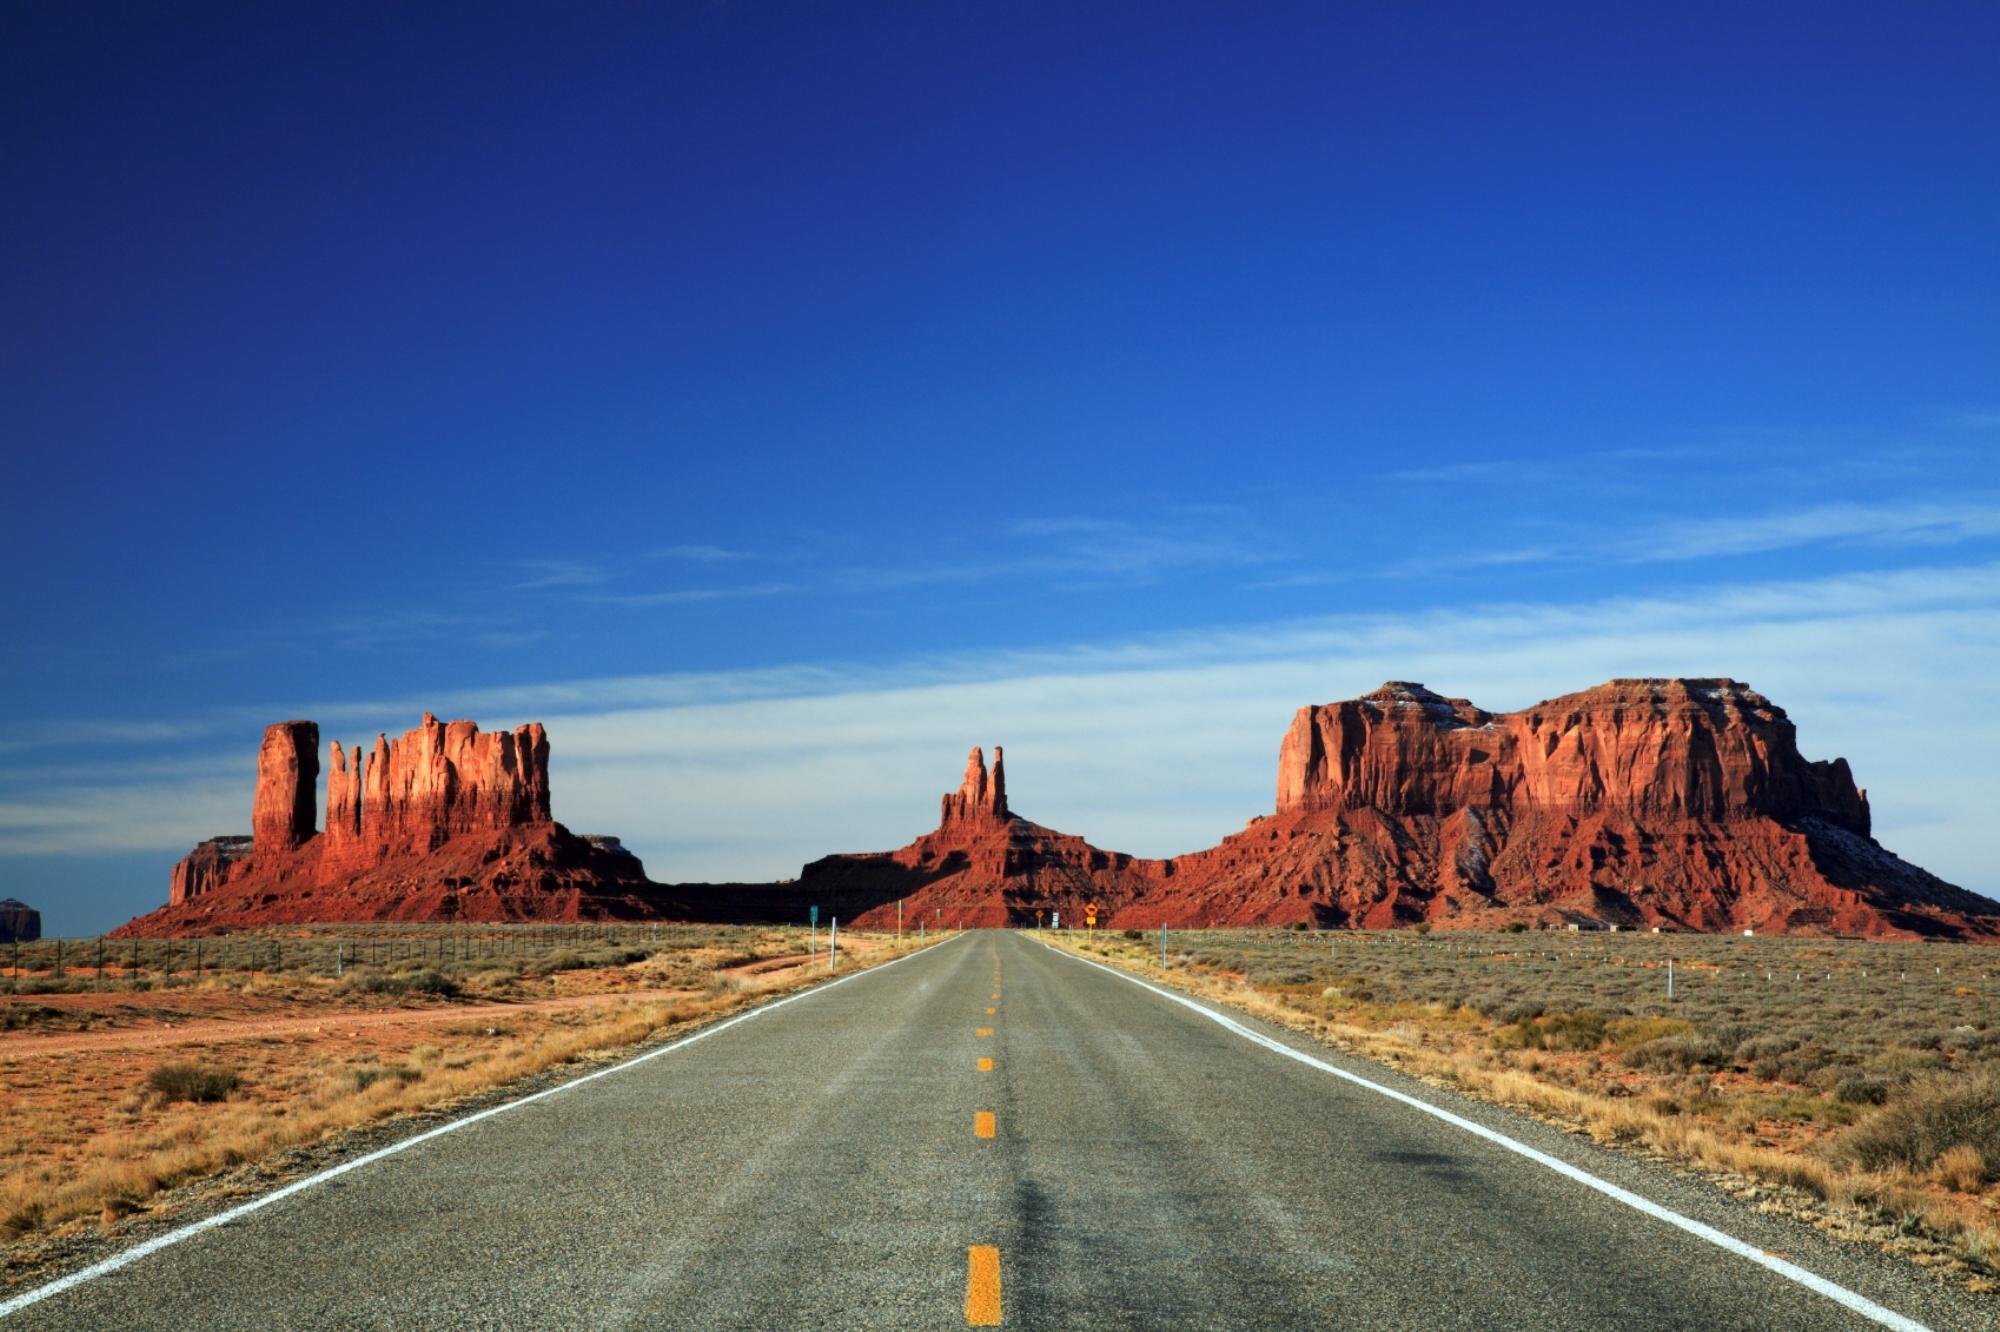 Tours Of Monument Valley Arizona